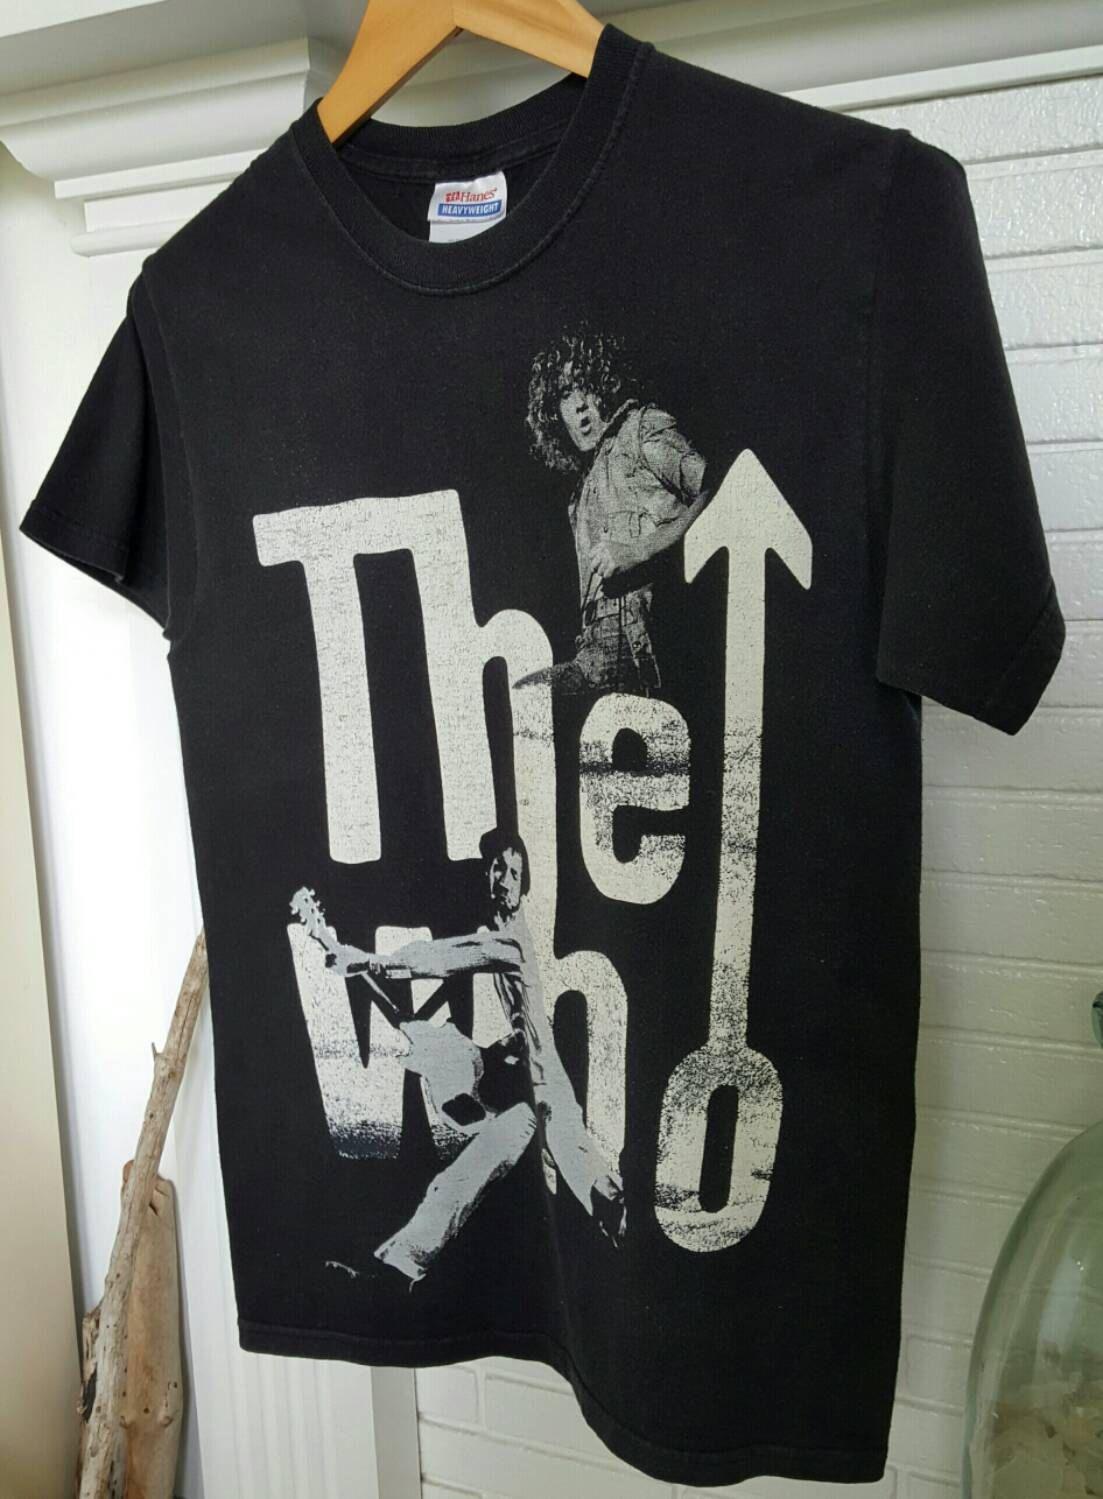 Black sabbath t shirt etsy - The Who Shirt Who Shirts Band Concert T Shirt By Resouledgypsy On Etsy